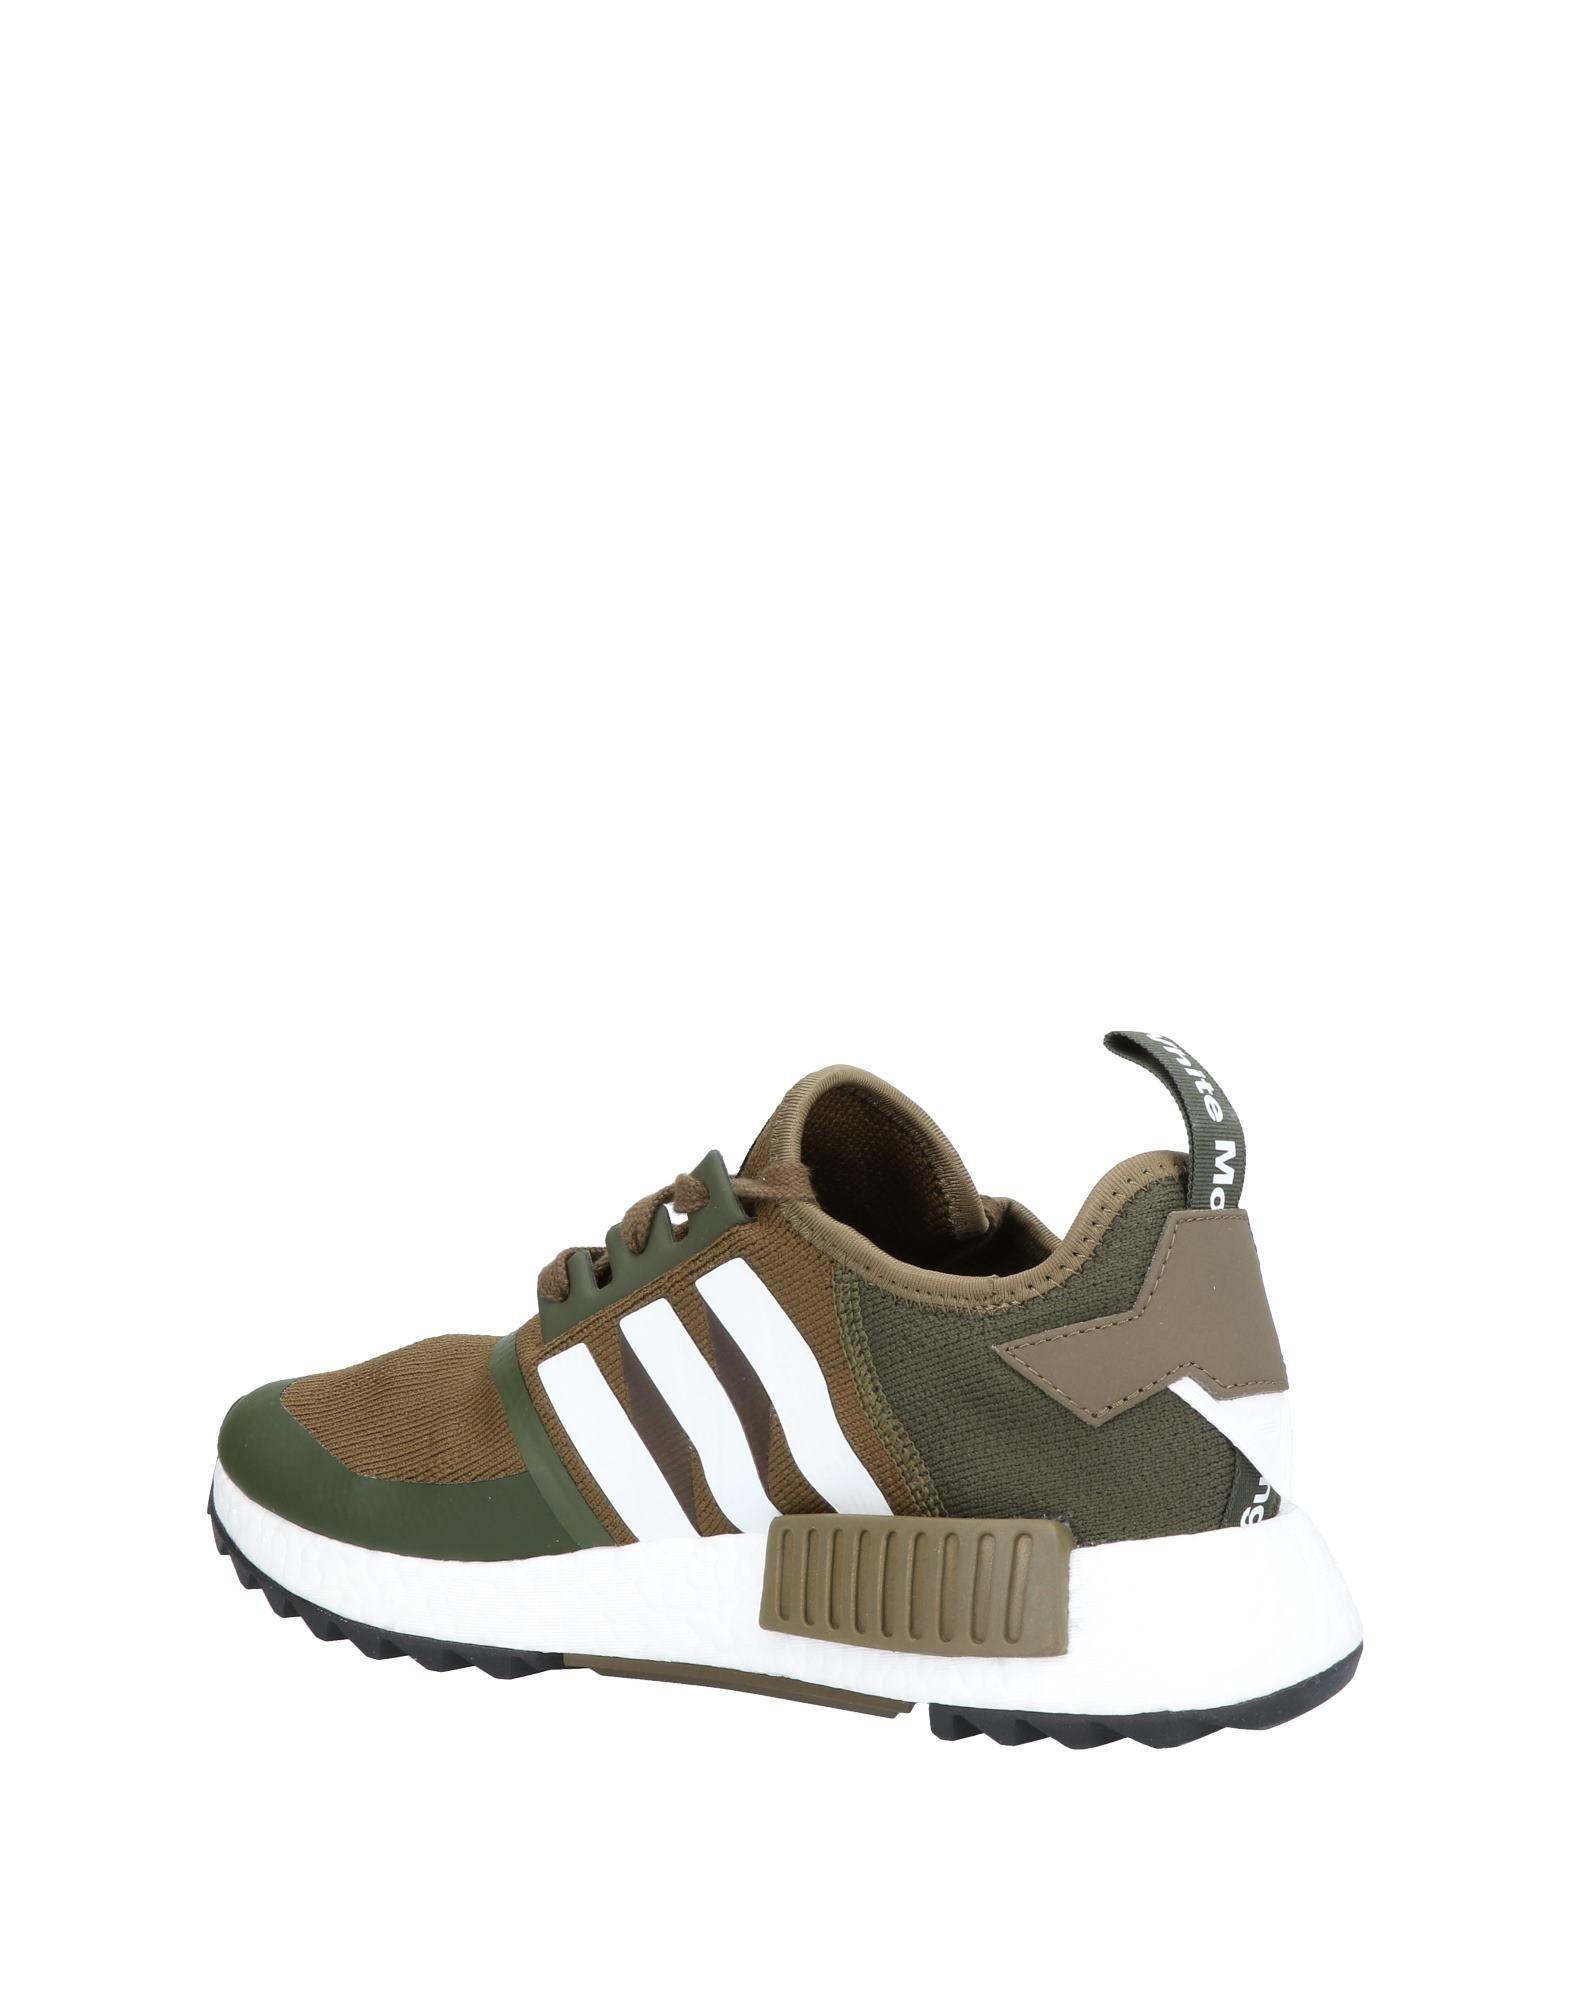 Rabatt echte Schuhe Herren Adidas Originals By White Mountaineering Sneakers Herren Schuhe  11459969QC 7e9b75